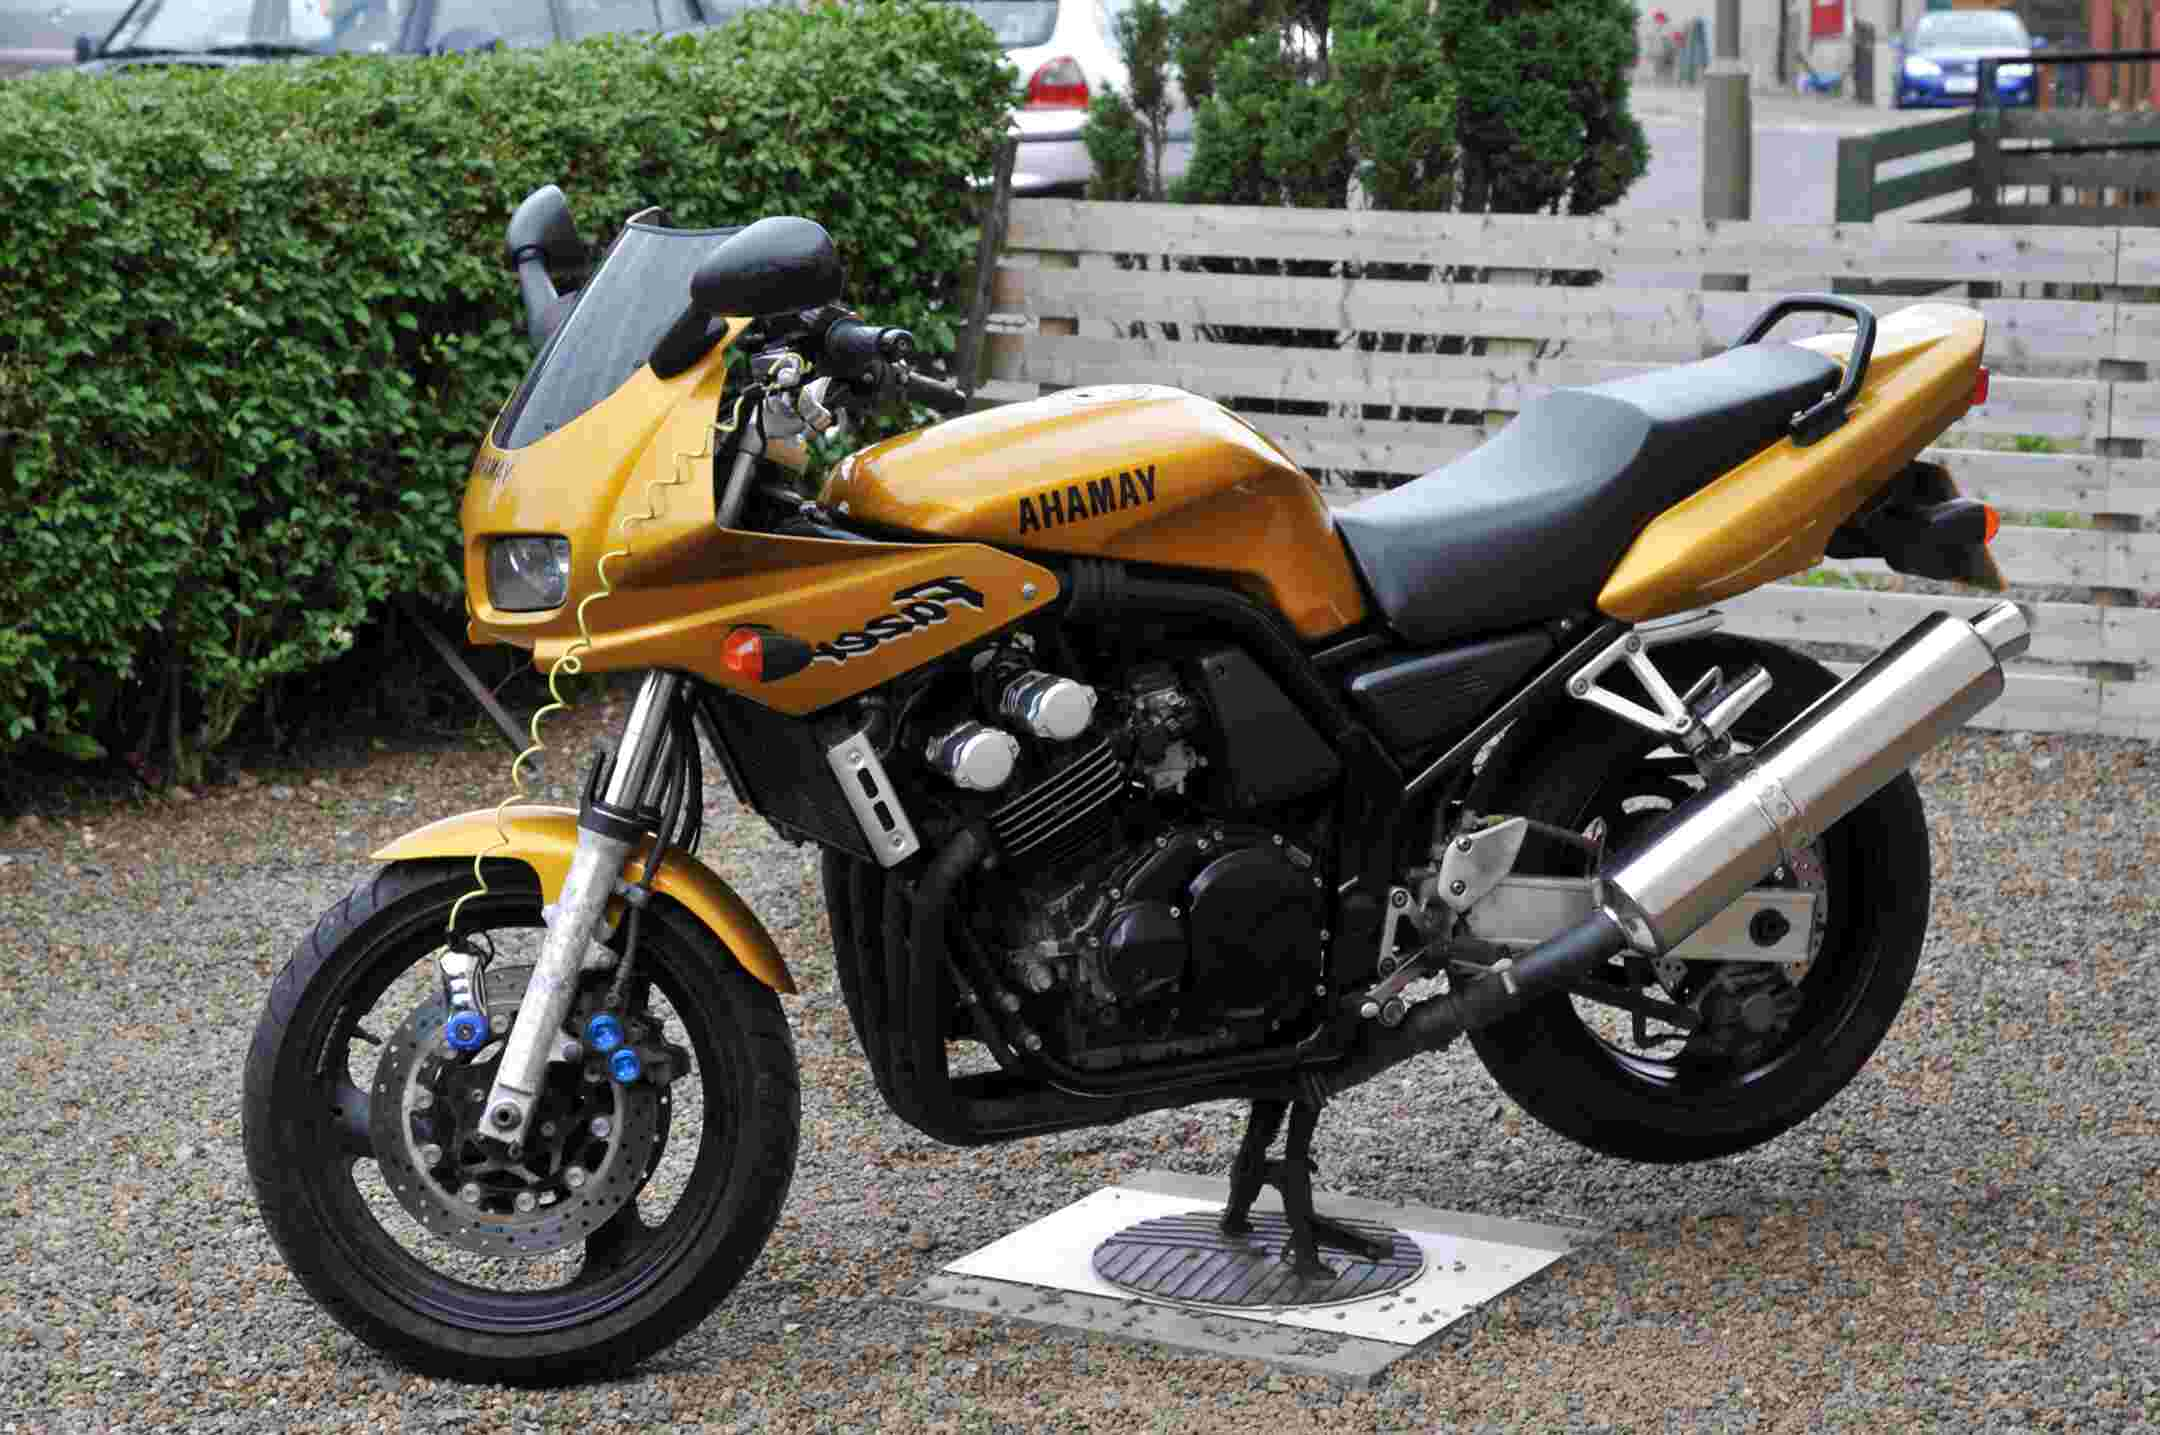 yamaha fazer fzs 600 motorcycle for sale